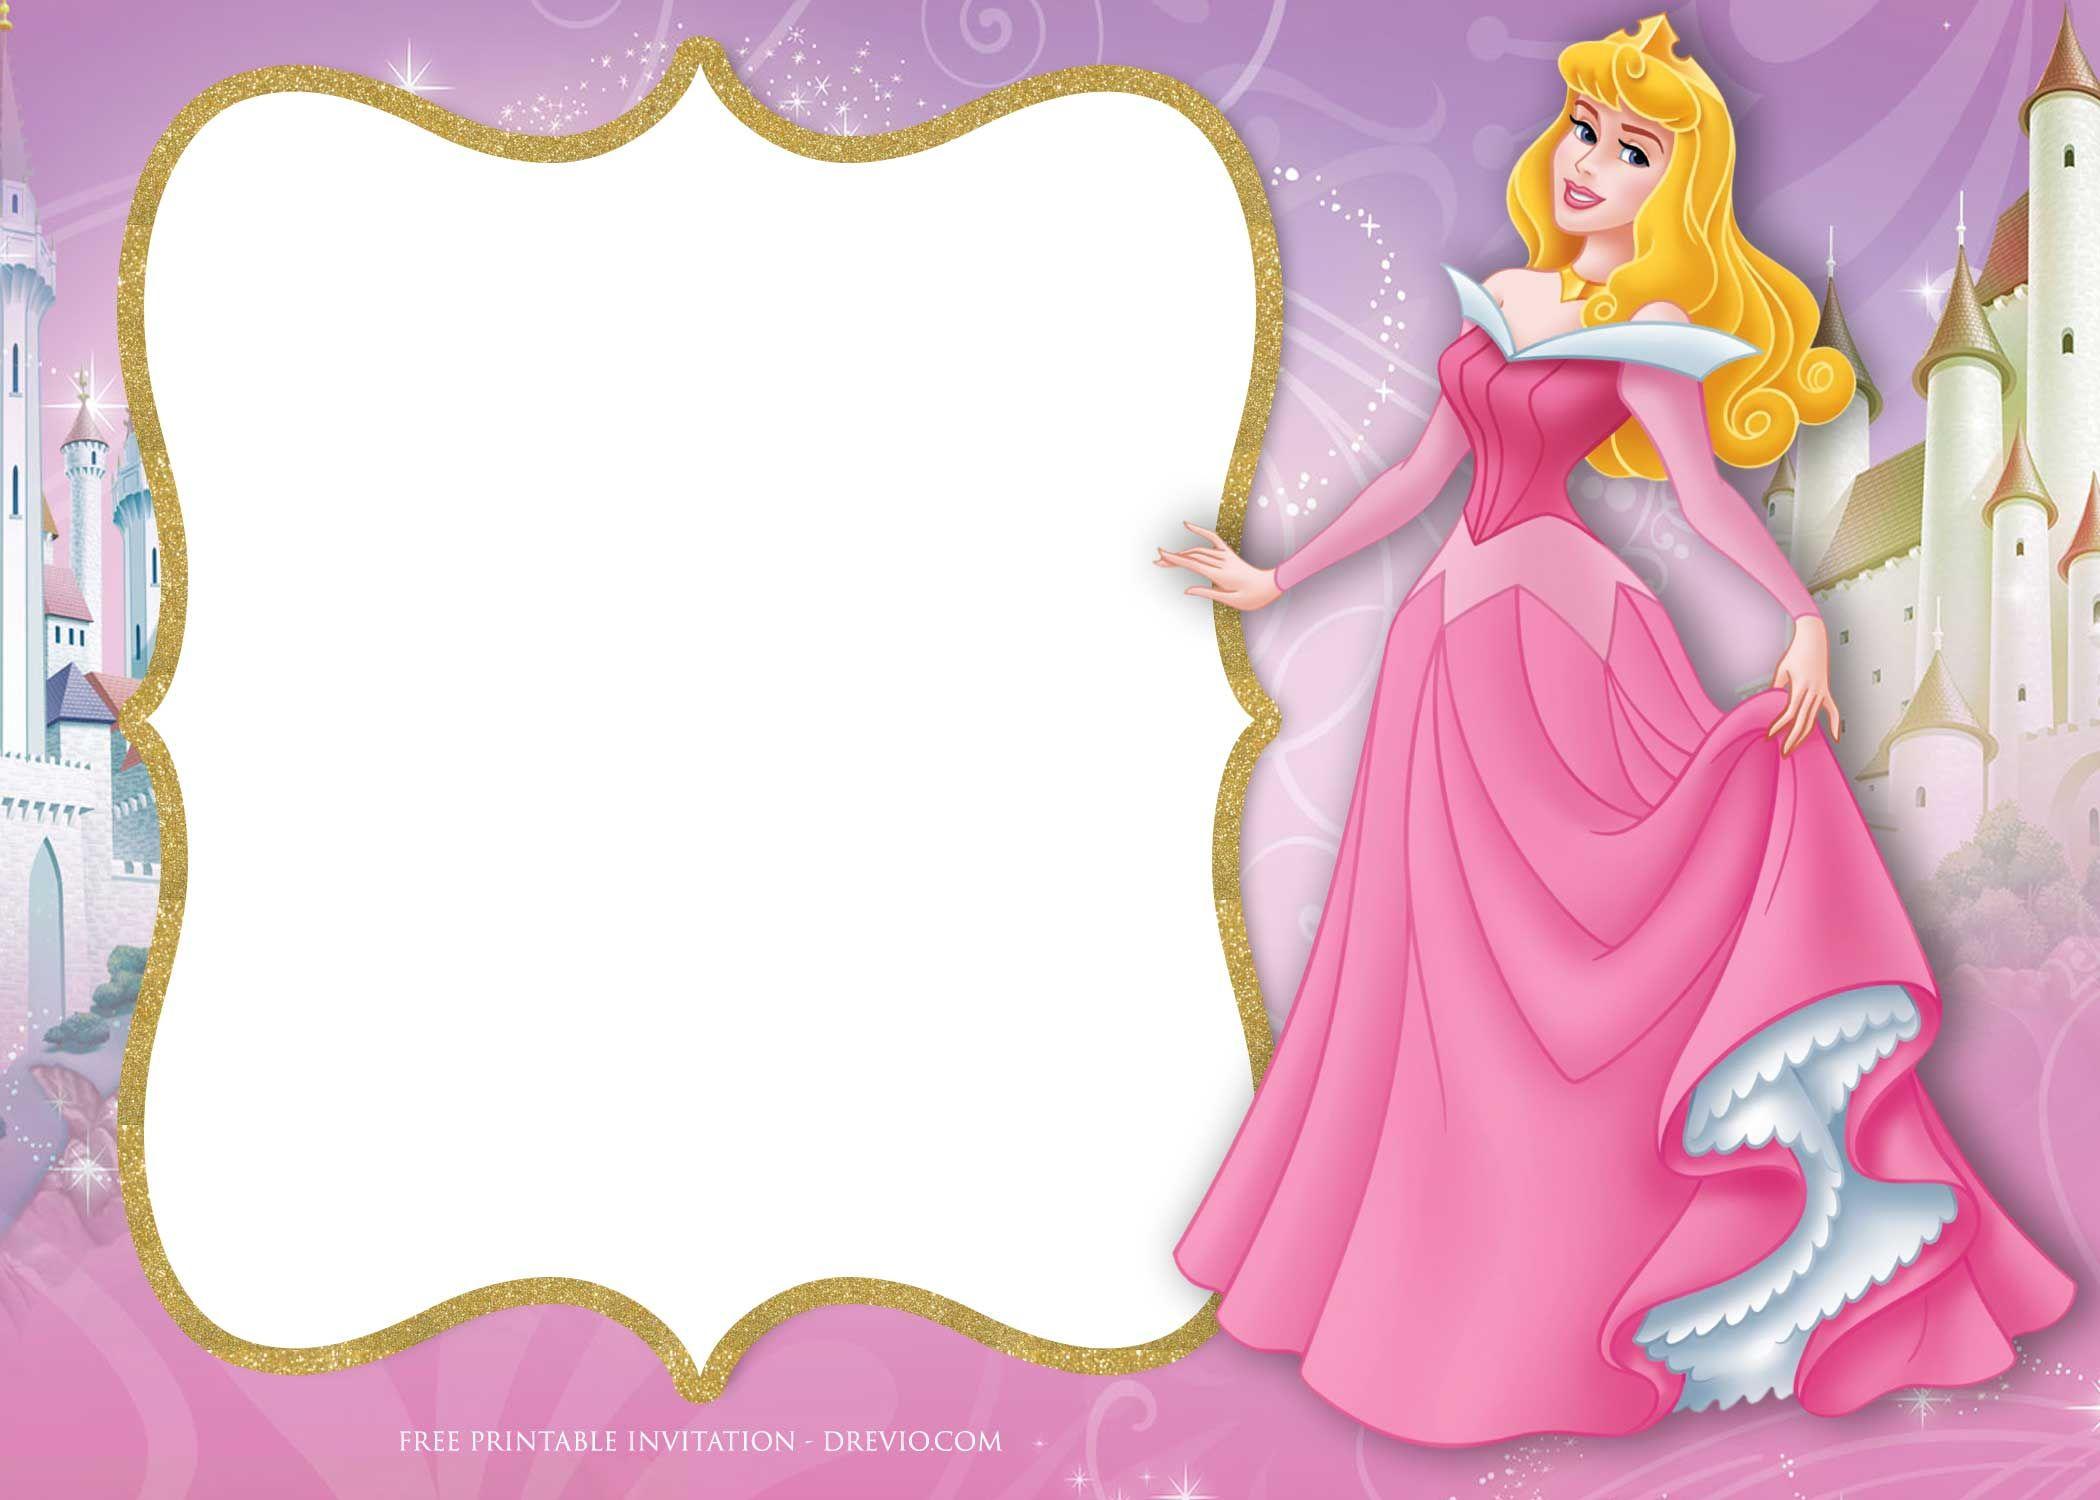 Free Printable Princess Aurora Sleeping Beauty Invitation - Free Princess Printable Invitations